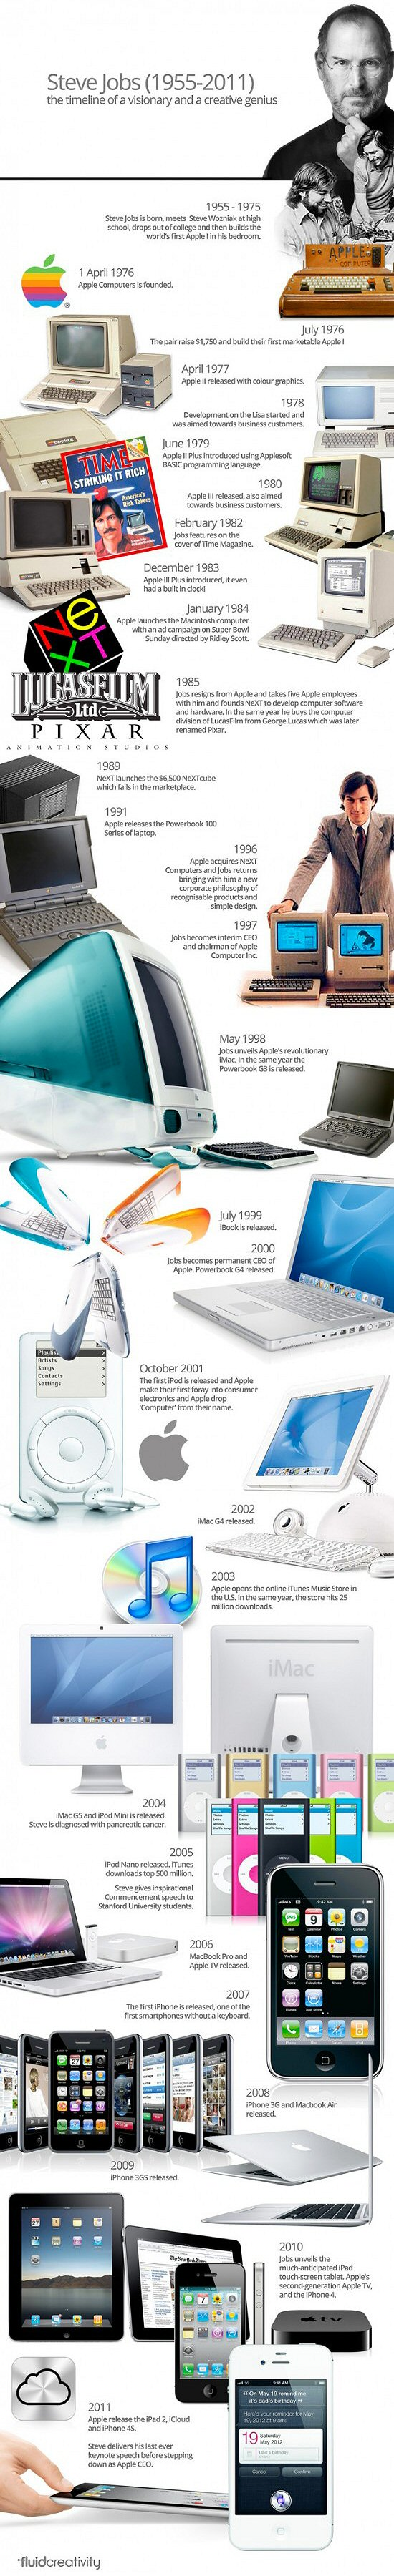 timeline de Steve Jobs